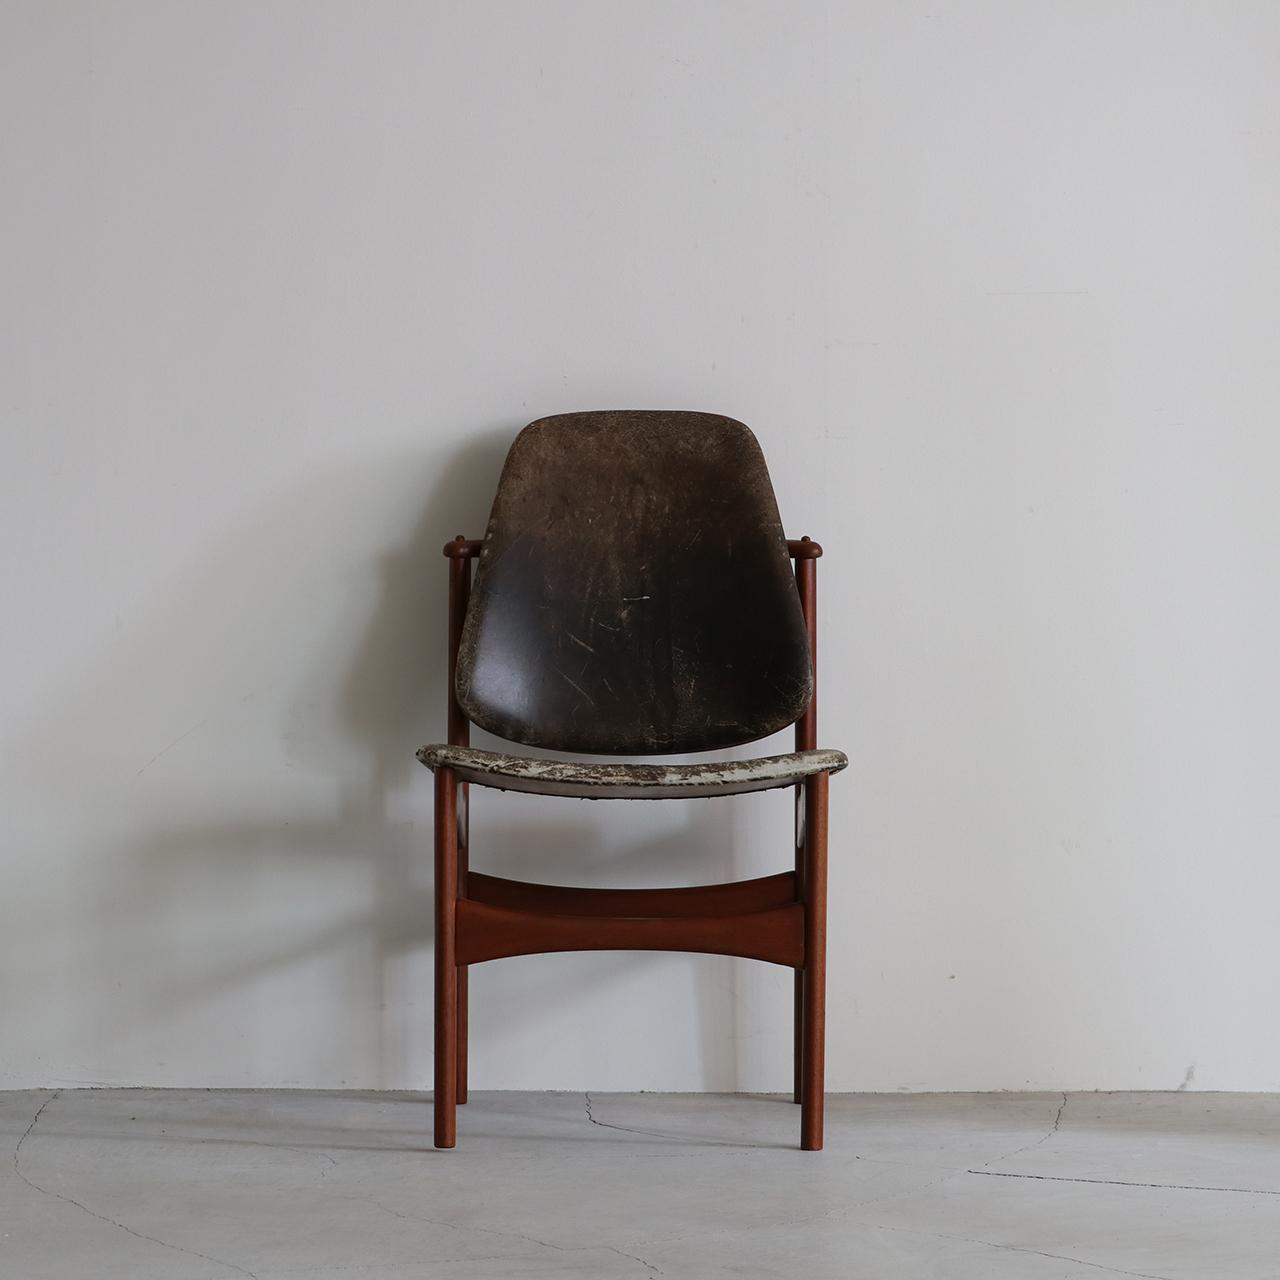 Dining chair /Onsild Møbelfabrik /Arne Hovmand-Olsen